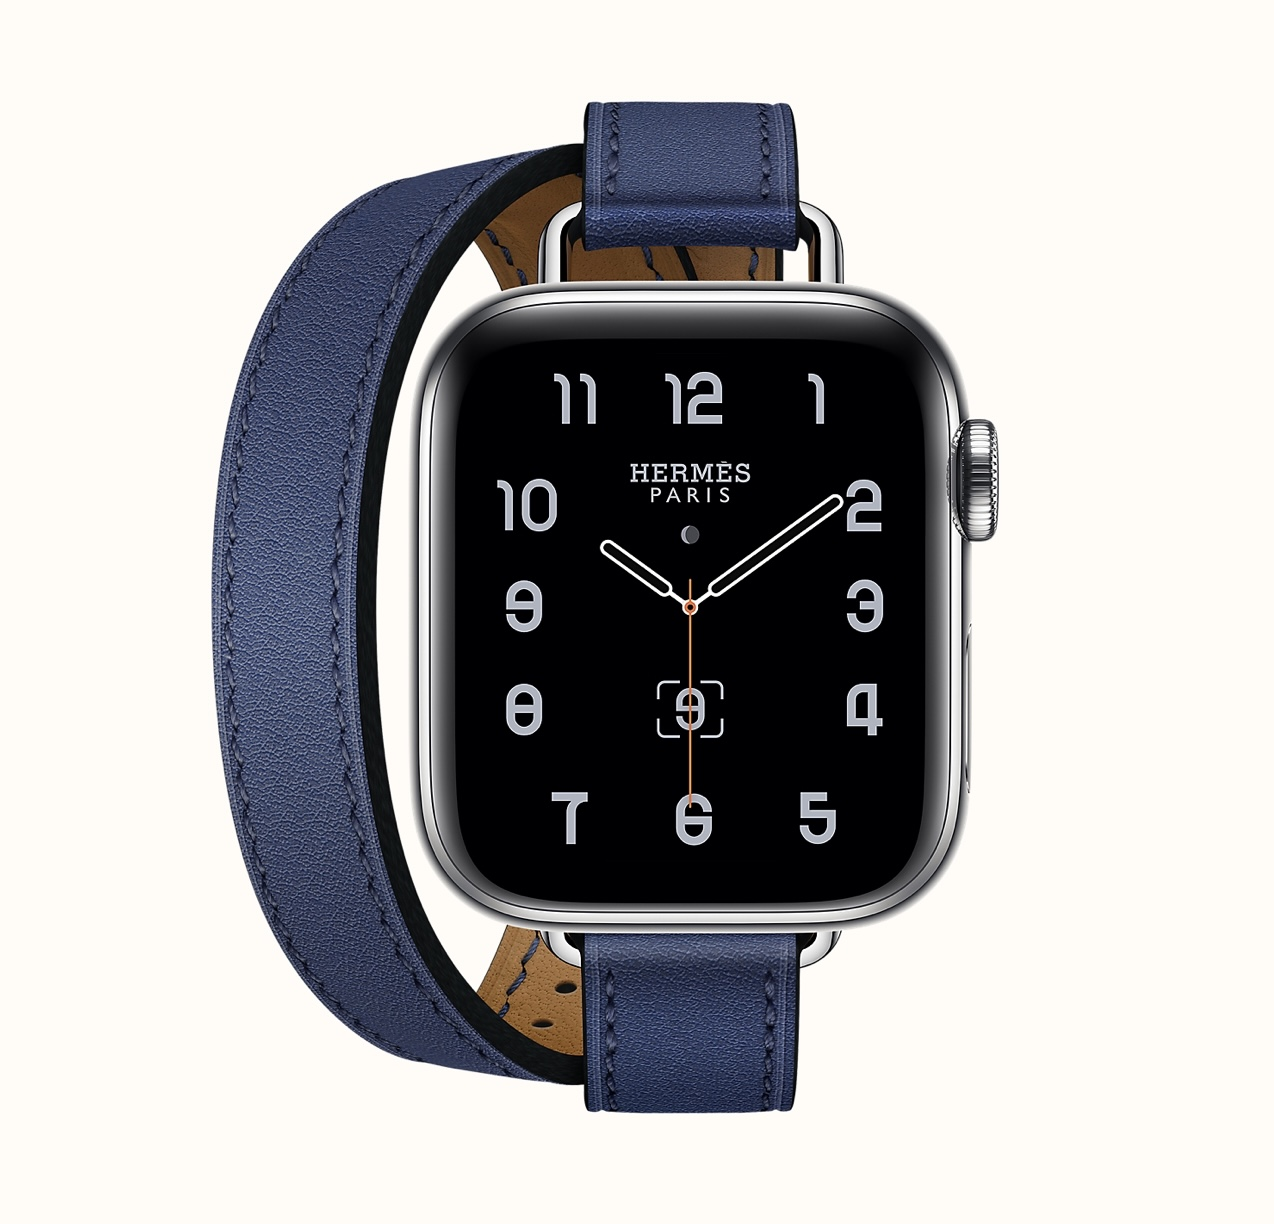 Series 6 case & Band Apple Watch Hermes Double Tour 40 mm Attelage. Photo via Hermes.com.